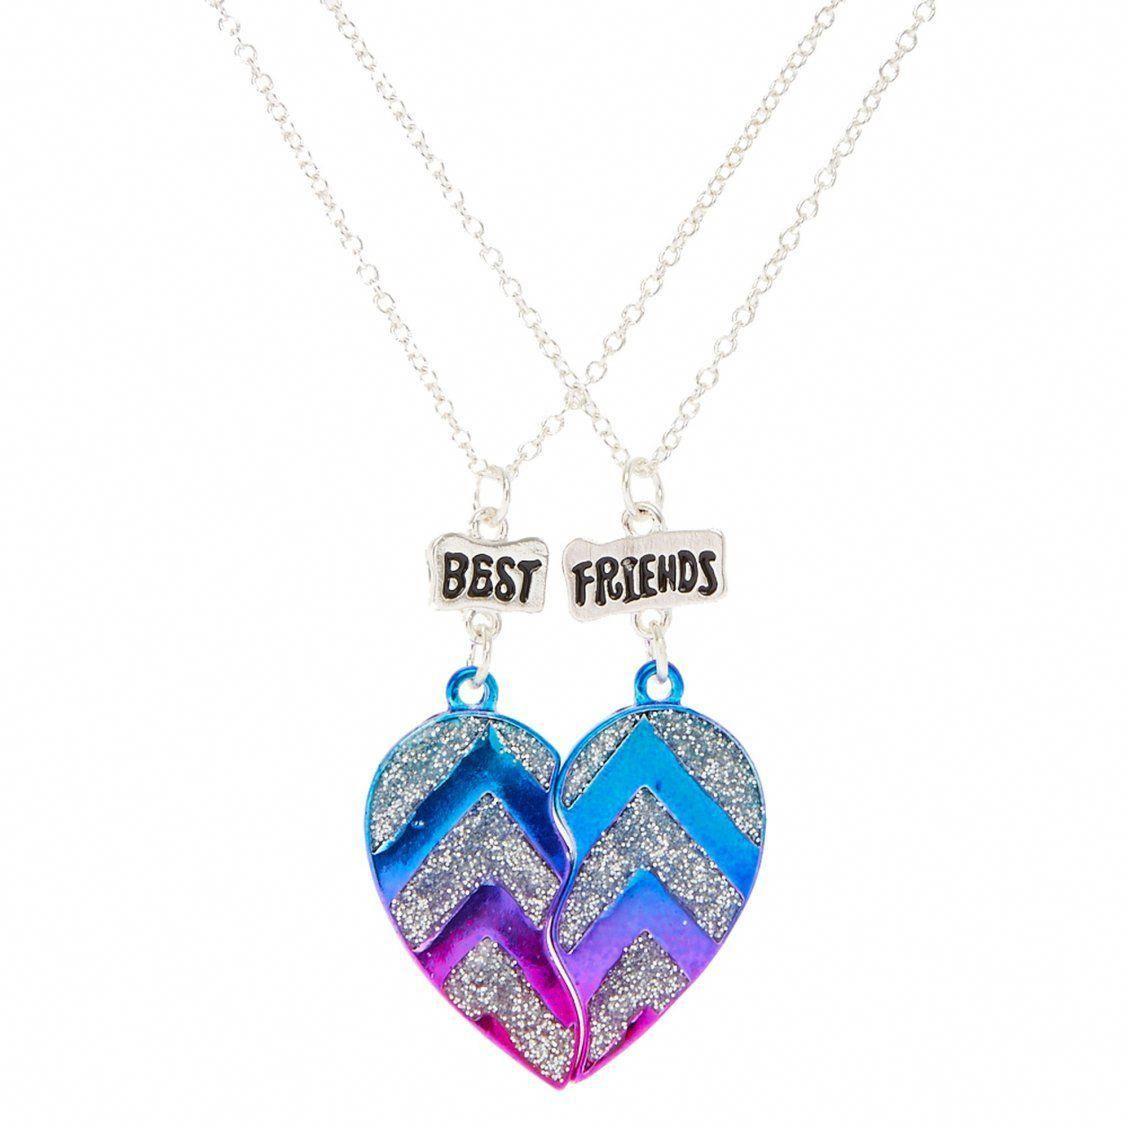 Best Friends Metallic Glitter Chevron Split Heart Pendant Necklaces This Pair Of Best Friend Necklaces Friend Necklaces Best Friend Necklaces Friend Jewelry